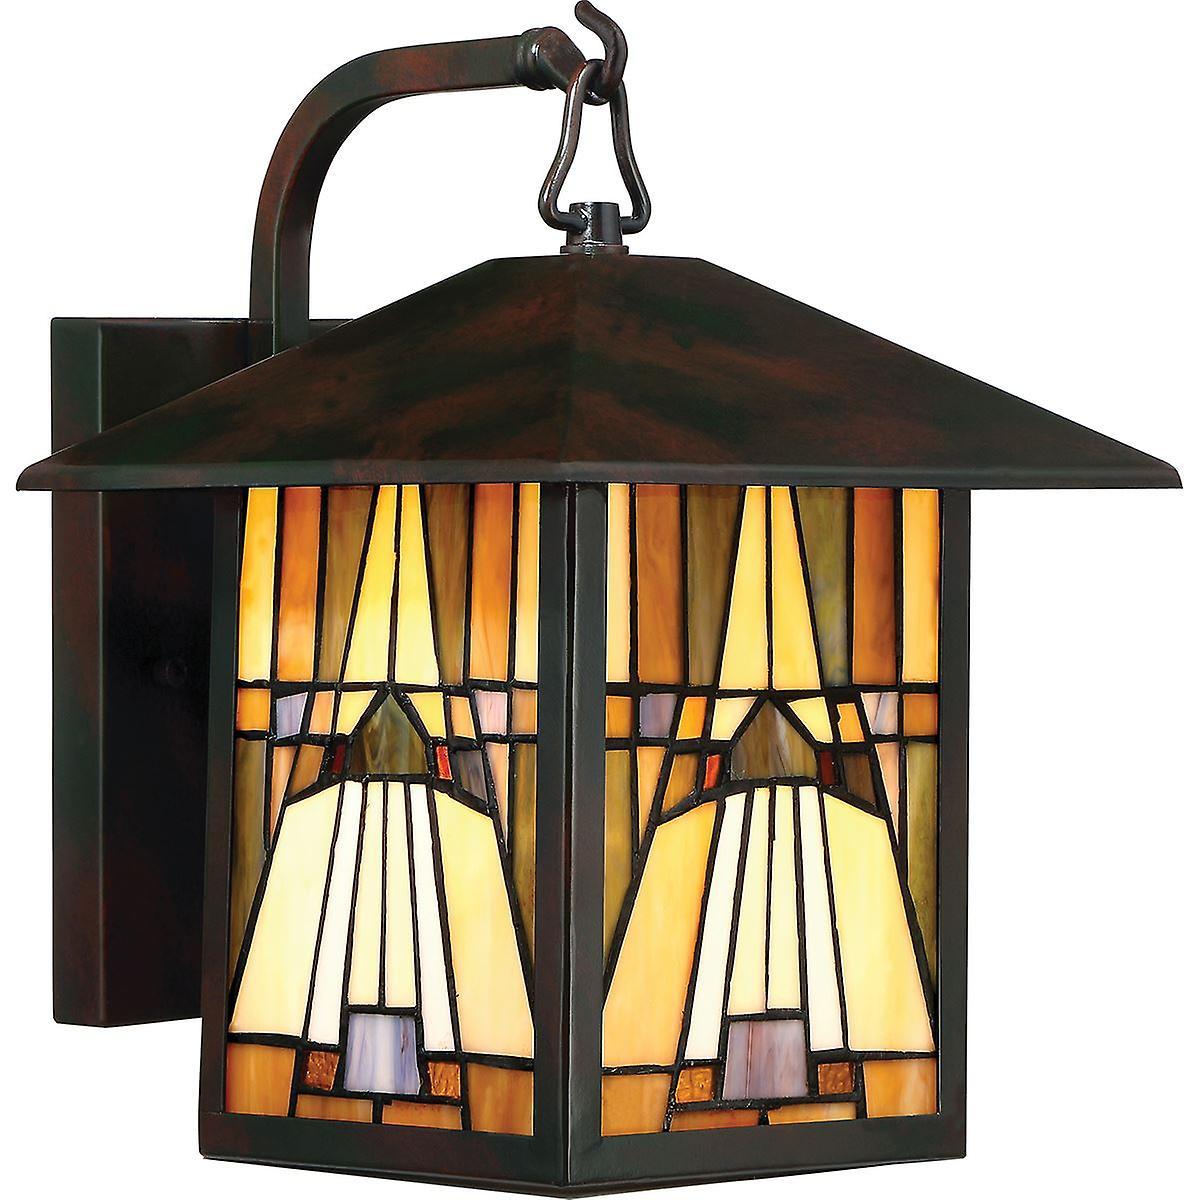 Elstead - 1 lumière de plein air Medium lanterne murale - Bronze Finish - QZ INGLENOOK2 M